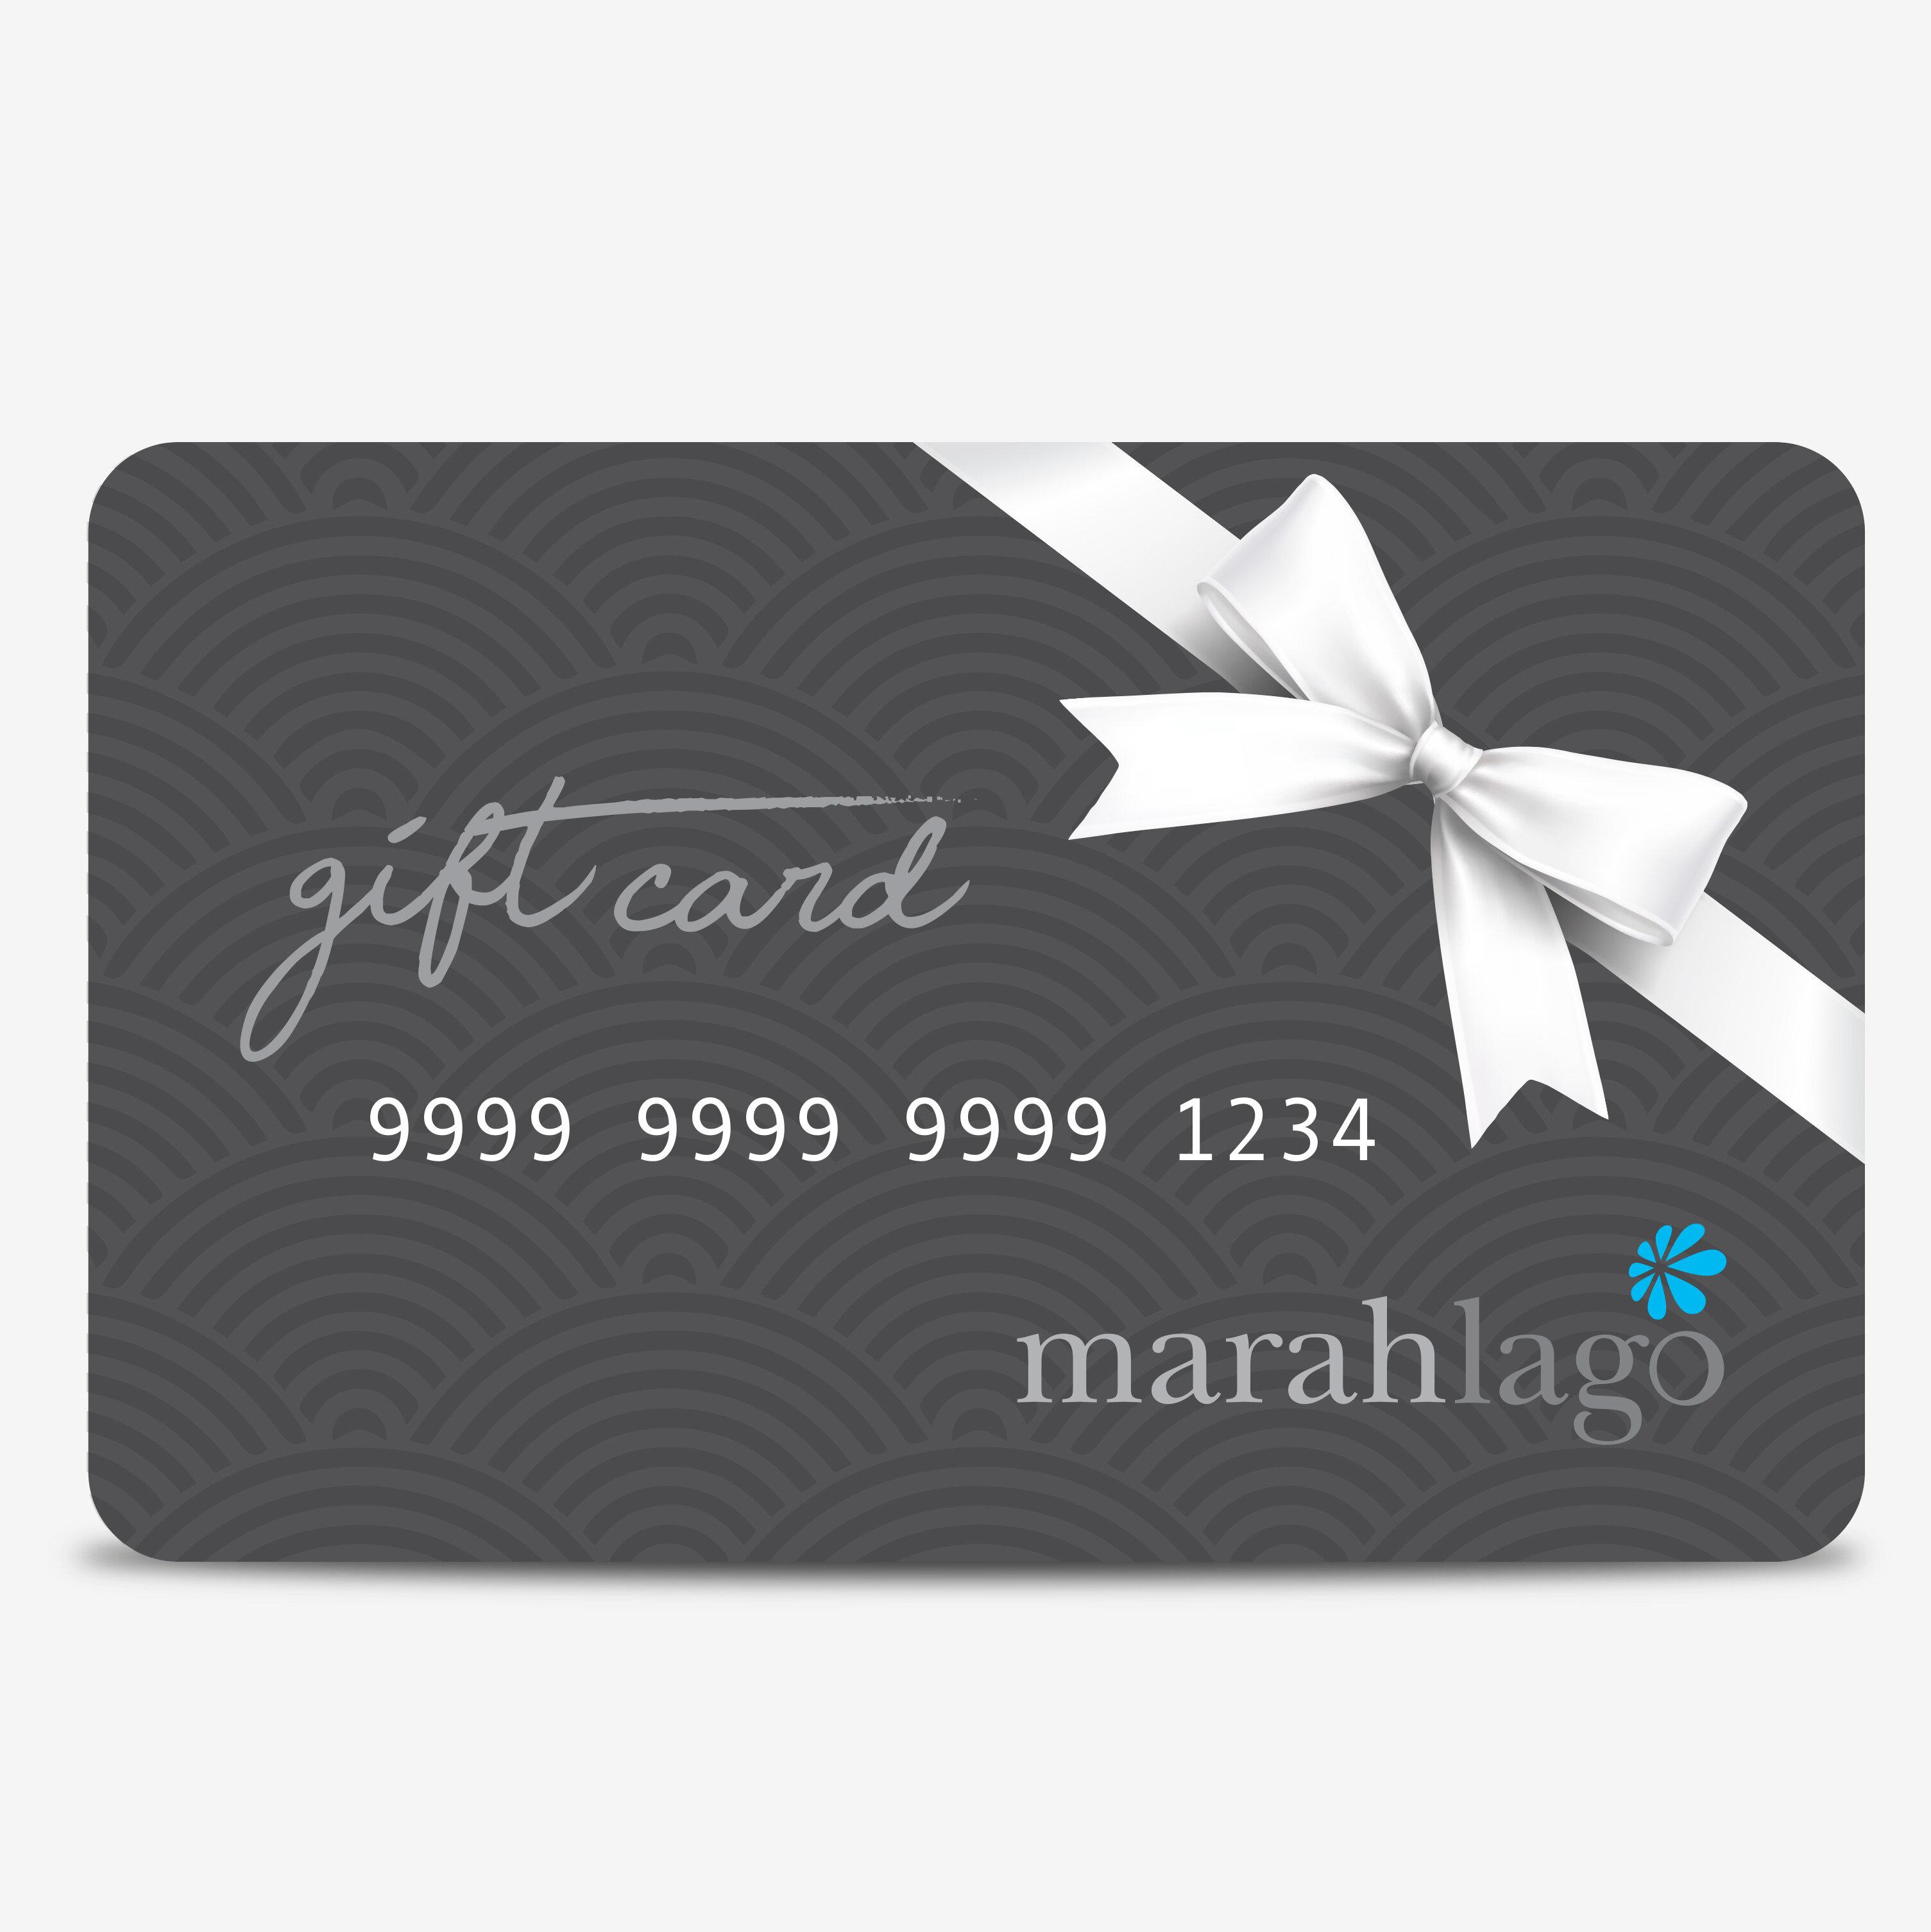 Marahlago Larimar Jewelry Gift Card Purchase